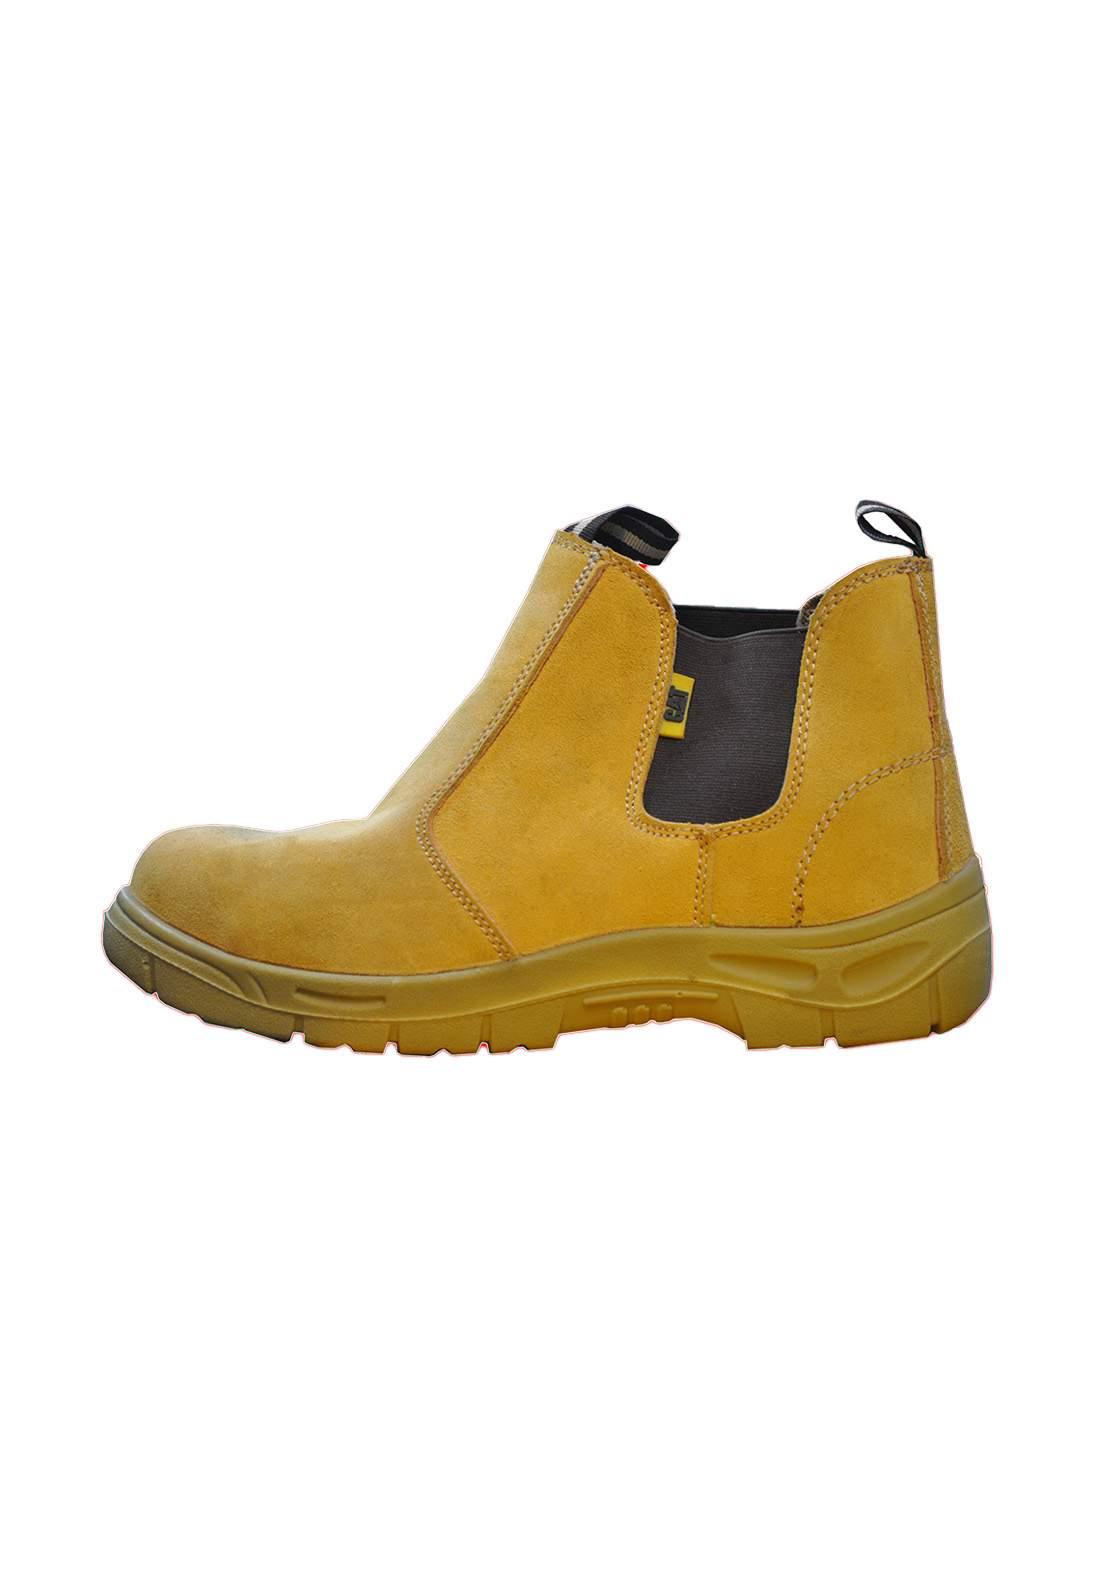 Subul AlHurra Cut Safety Shoes حذاء امان